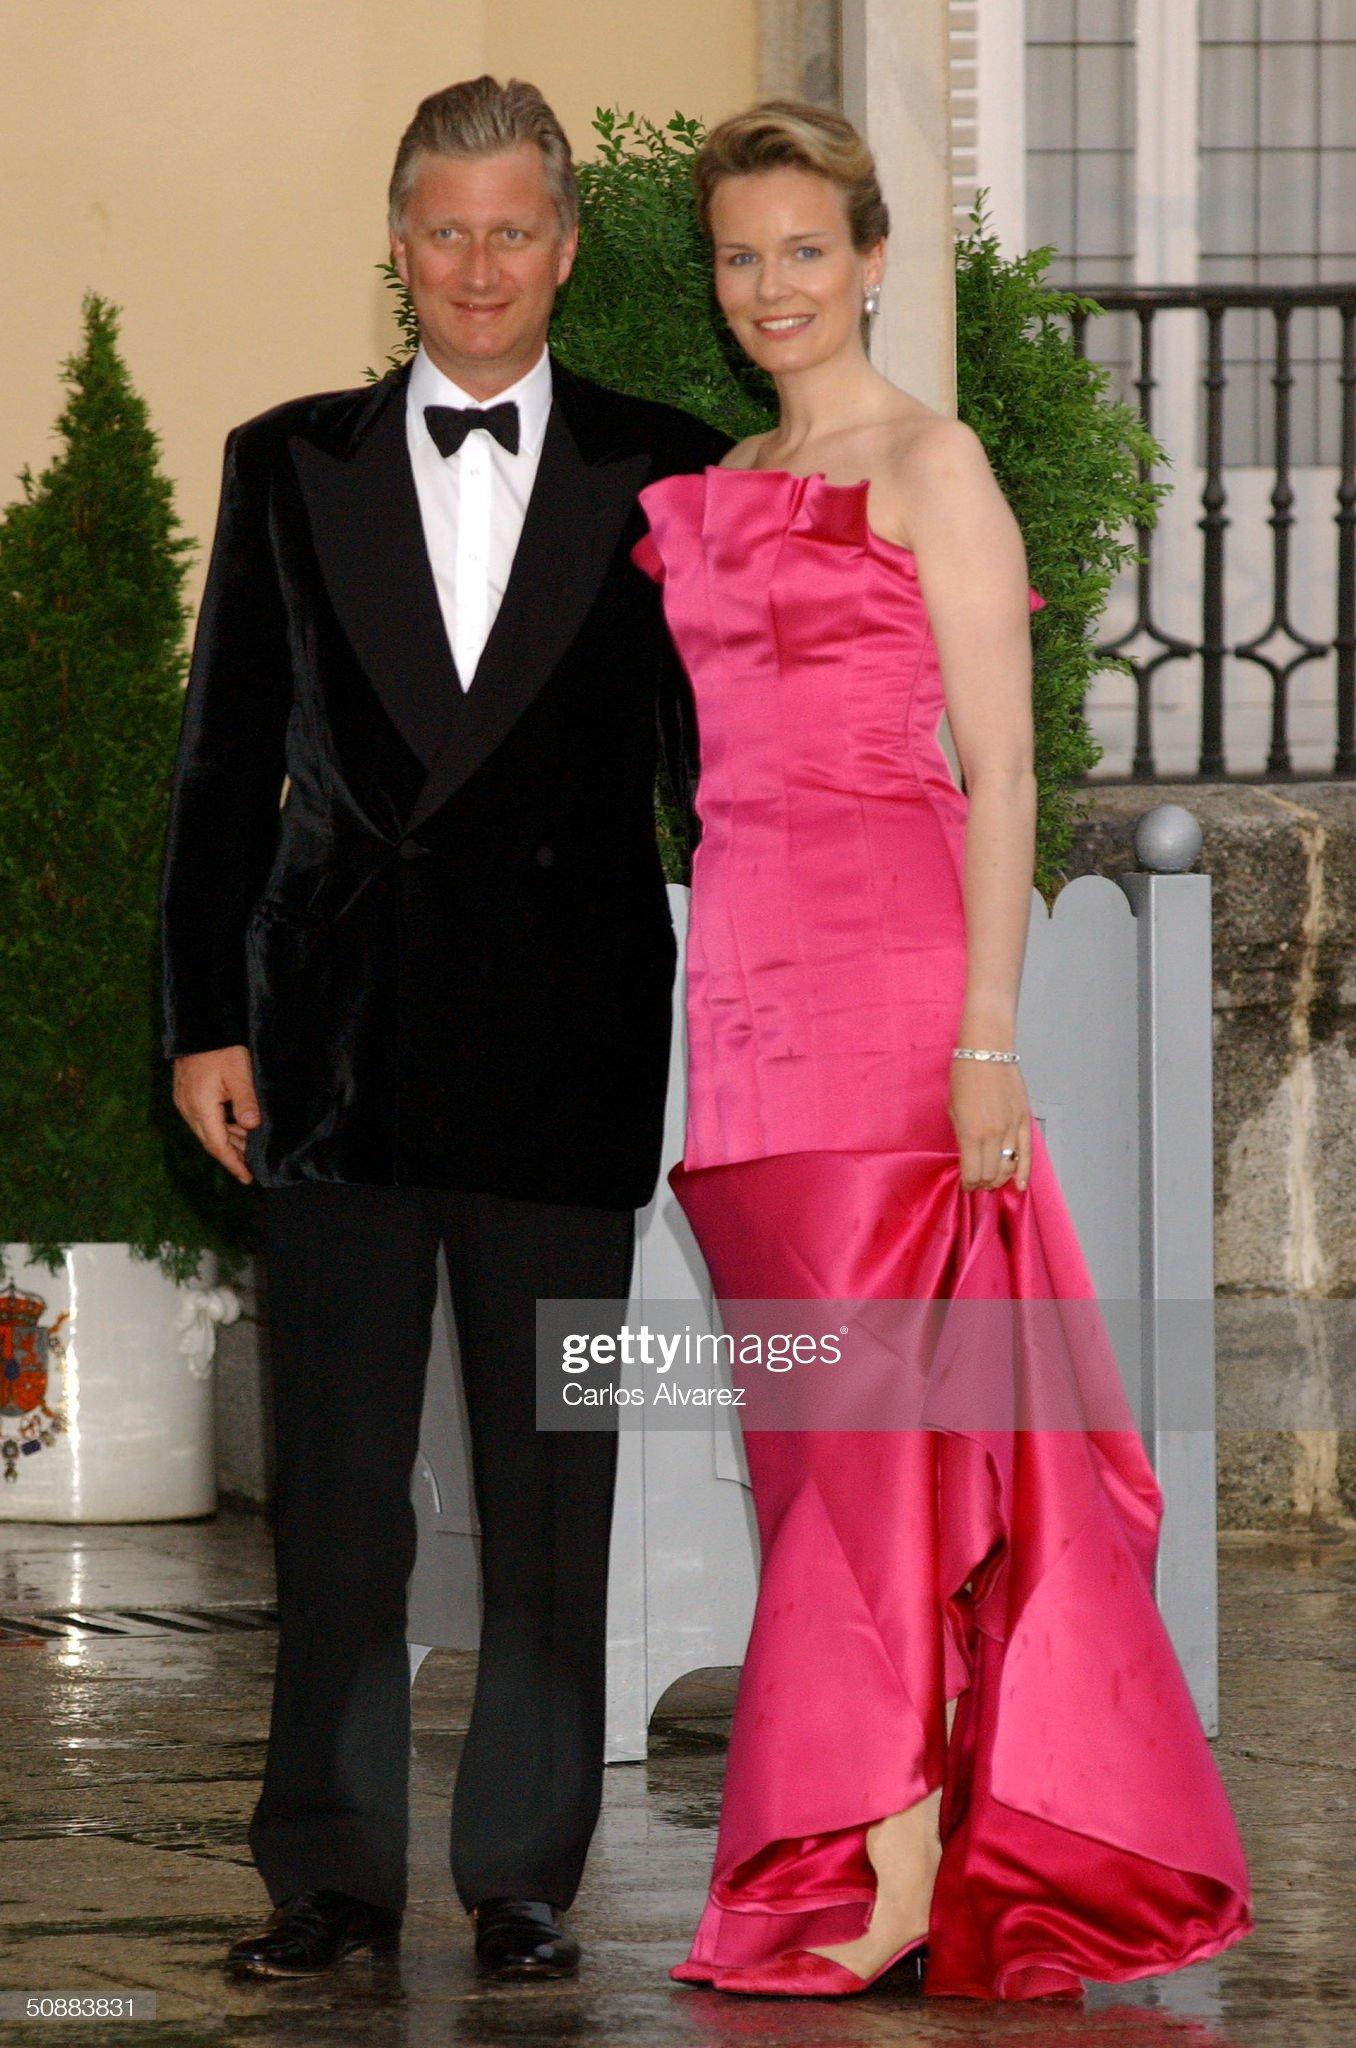 Вечерние наряды Королевы Матильды Gala Dinner at El Pardo Royal Palace In Preparation Spanish Wedding : News Photo